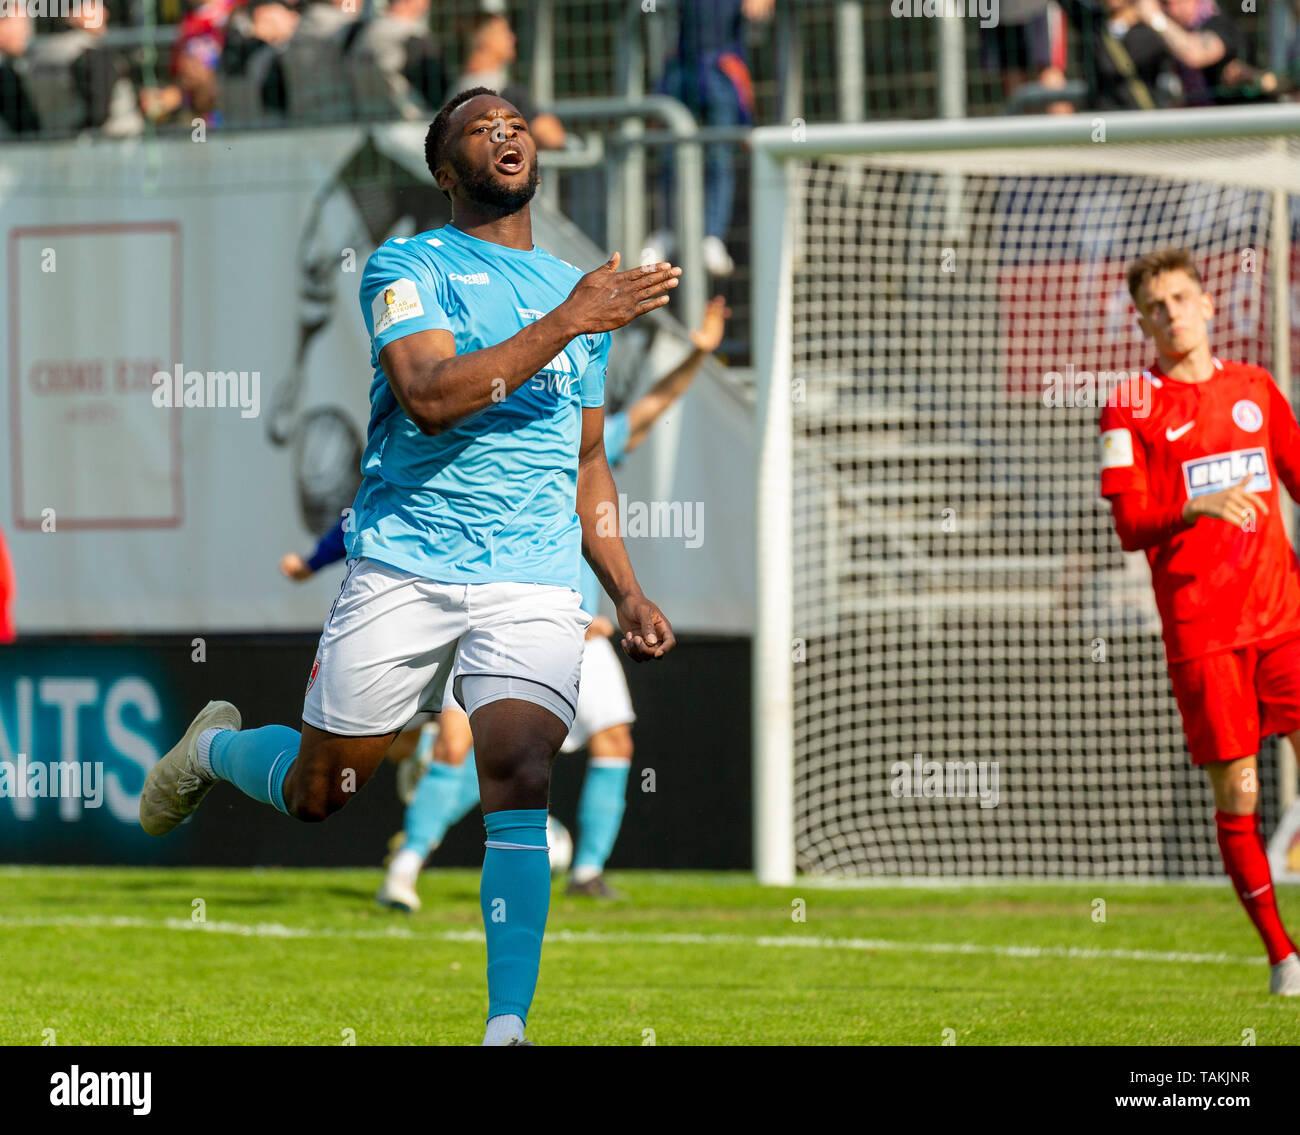 Sport, Fussball, Reviersport Niederrheinpokal, 2018/2019, Finale, Wuppertaler SV vs. KFC Uerdingen 1-2, Stadion Am Zoo in Wuppertal, Siegtor zum 1-2, Torjubel von Torschuetze Osayamen Osawe (KFC), sports, football, Lower Rhine Cup, 2018/2019, final, Wuppertaler SV vs. KFC Uerdingen 1-2, Stadium Am Zoo in Wuppertal, 1-2 winning goal, goal scorer Osayamen Osawe (KFC) rejoicing *** Local Caption *** sports, football, Lower Rhine Cup, 2018/2019, final, Wuppertaler SV vs. KFC Uerdingen 1-2, Stadium Am Zoo in Wuppertal, 1-2 winning goal, goal scorer Osayamen Osawe (KFC) rejoicing - Stock Image